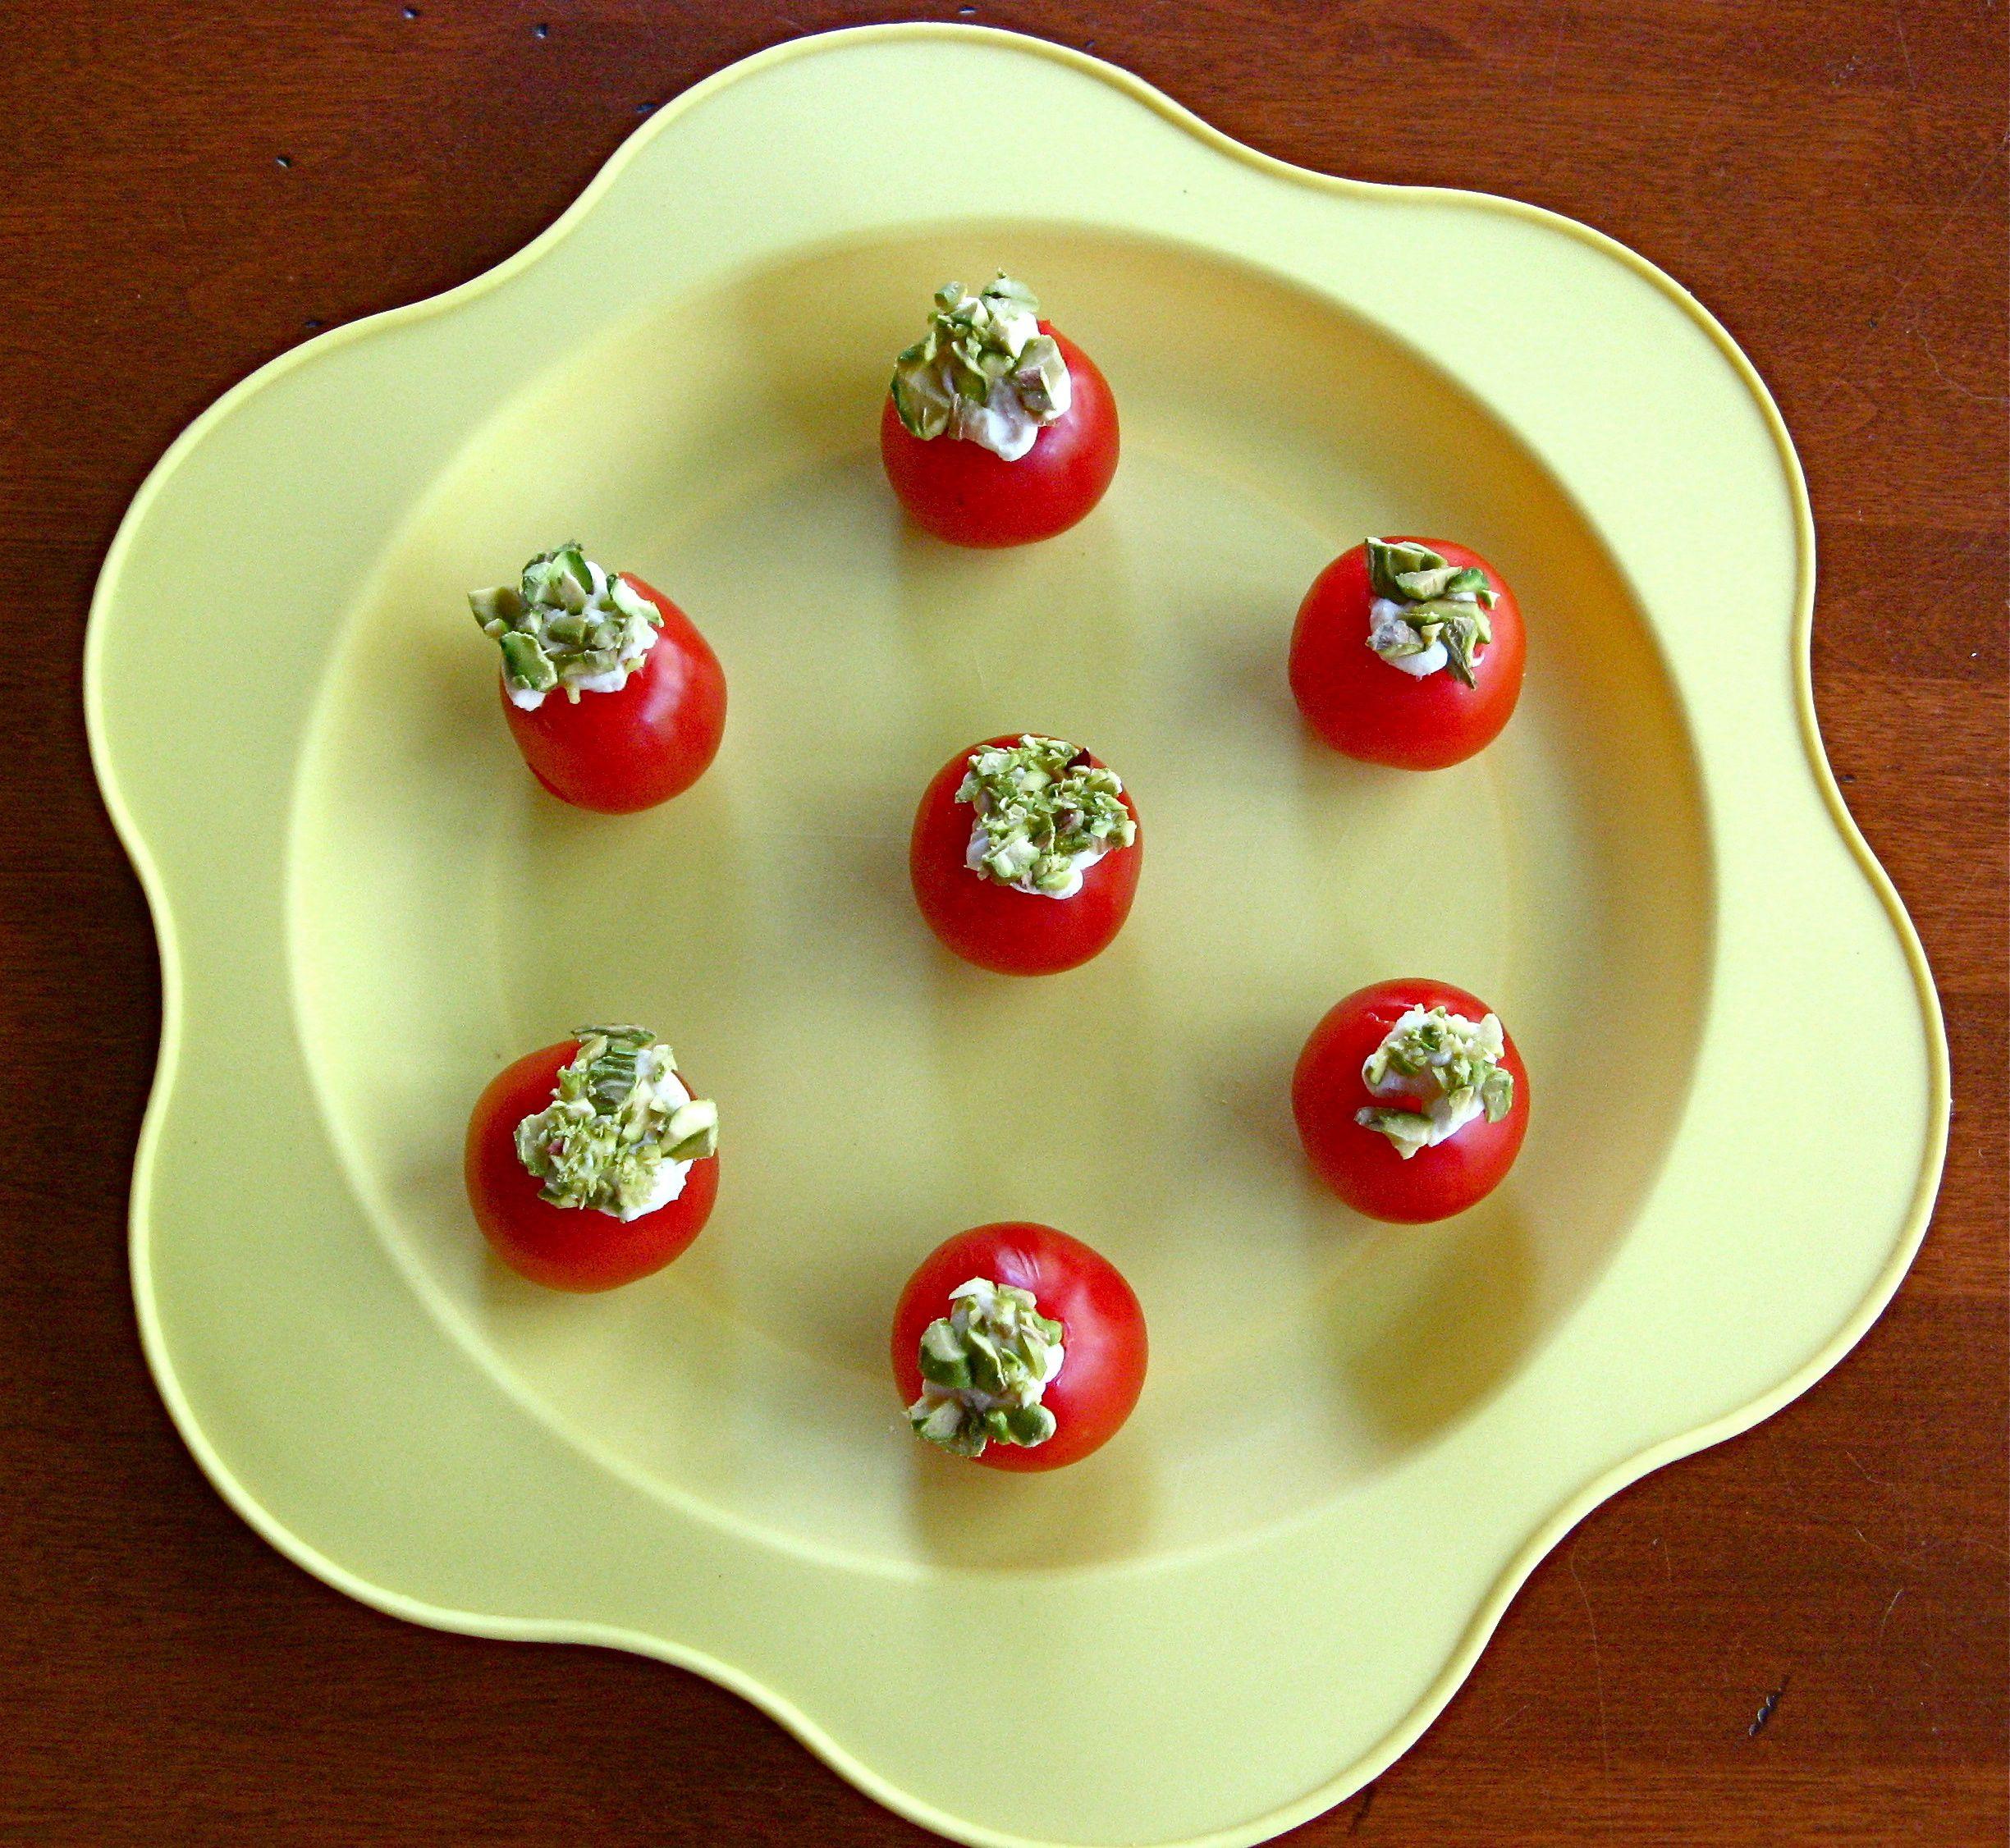 Easy+Party+Appetizers | Easy Party Appetizers 2 - Boursin Stuffed Tomatoes